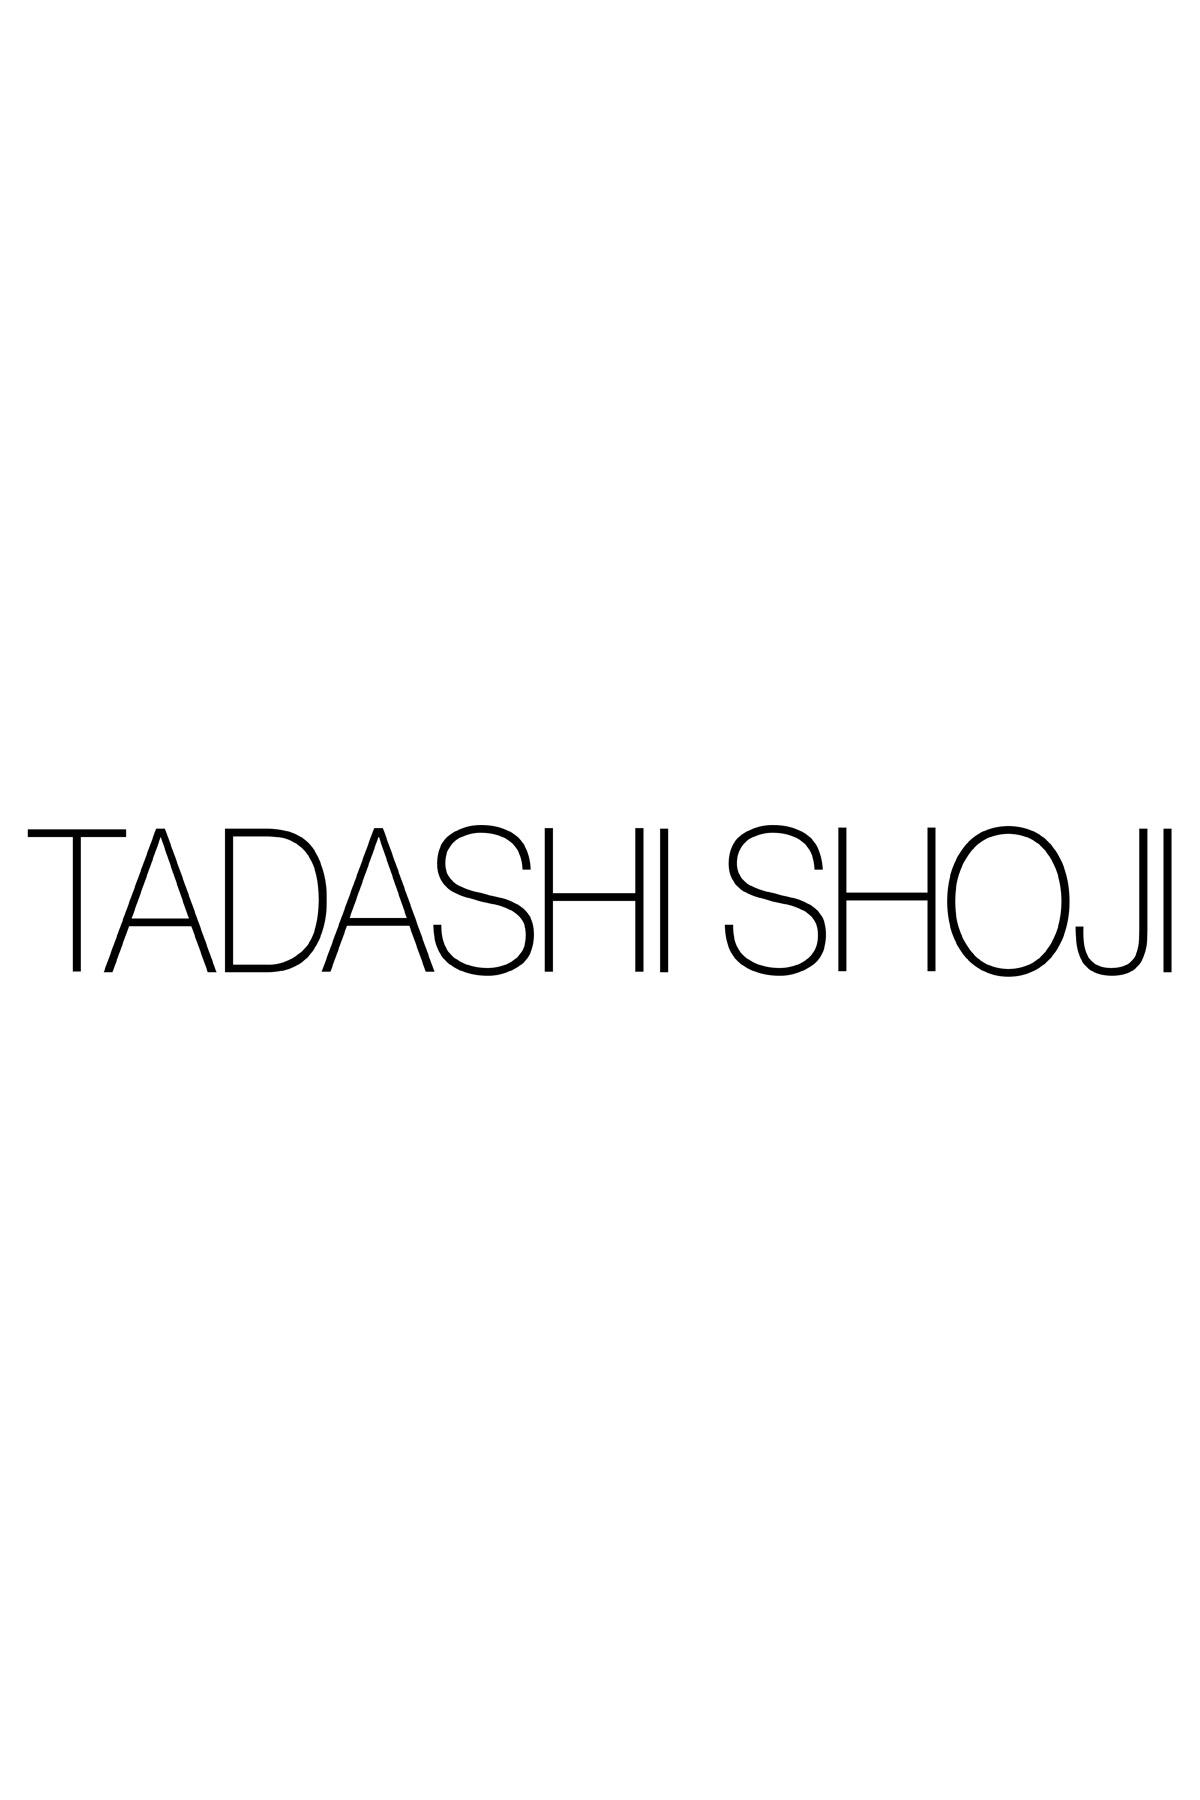 Tadashi Shoji x Bel Aire Bridal - Wired Pearl Tie Headband